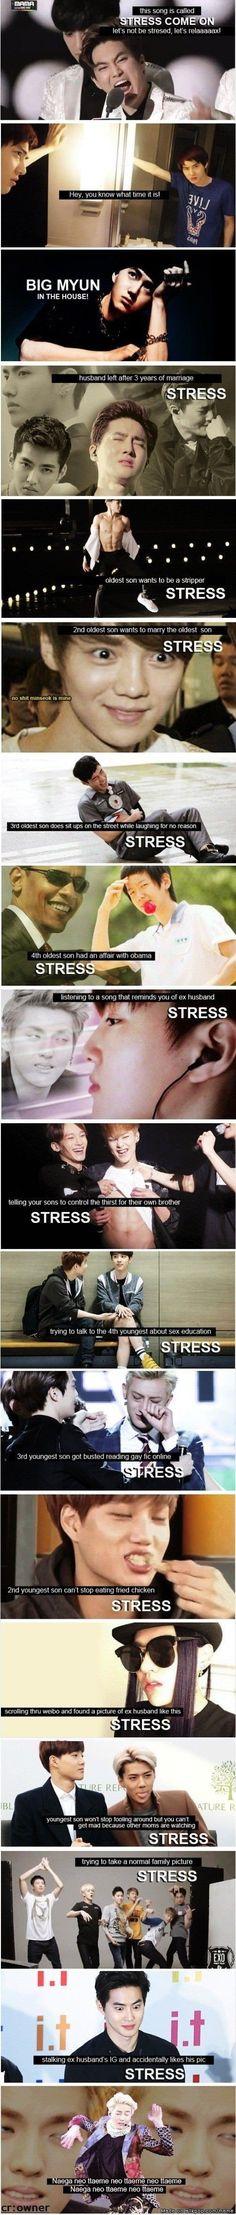 Big Byung - Stress Come On (Suho Remix). The stresses of being the mother of EXO. Exo Ot12, Kaisoo, Chanbaek, K Pop, Exo Memes, Kpop Exo, Exo K, 2ne1, Btob